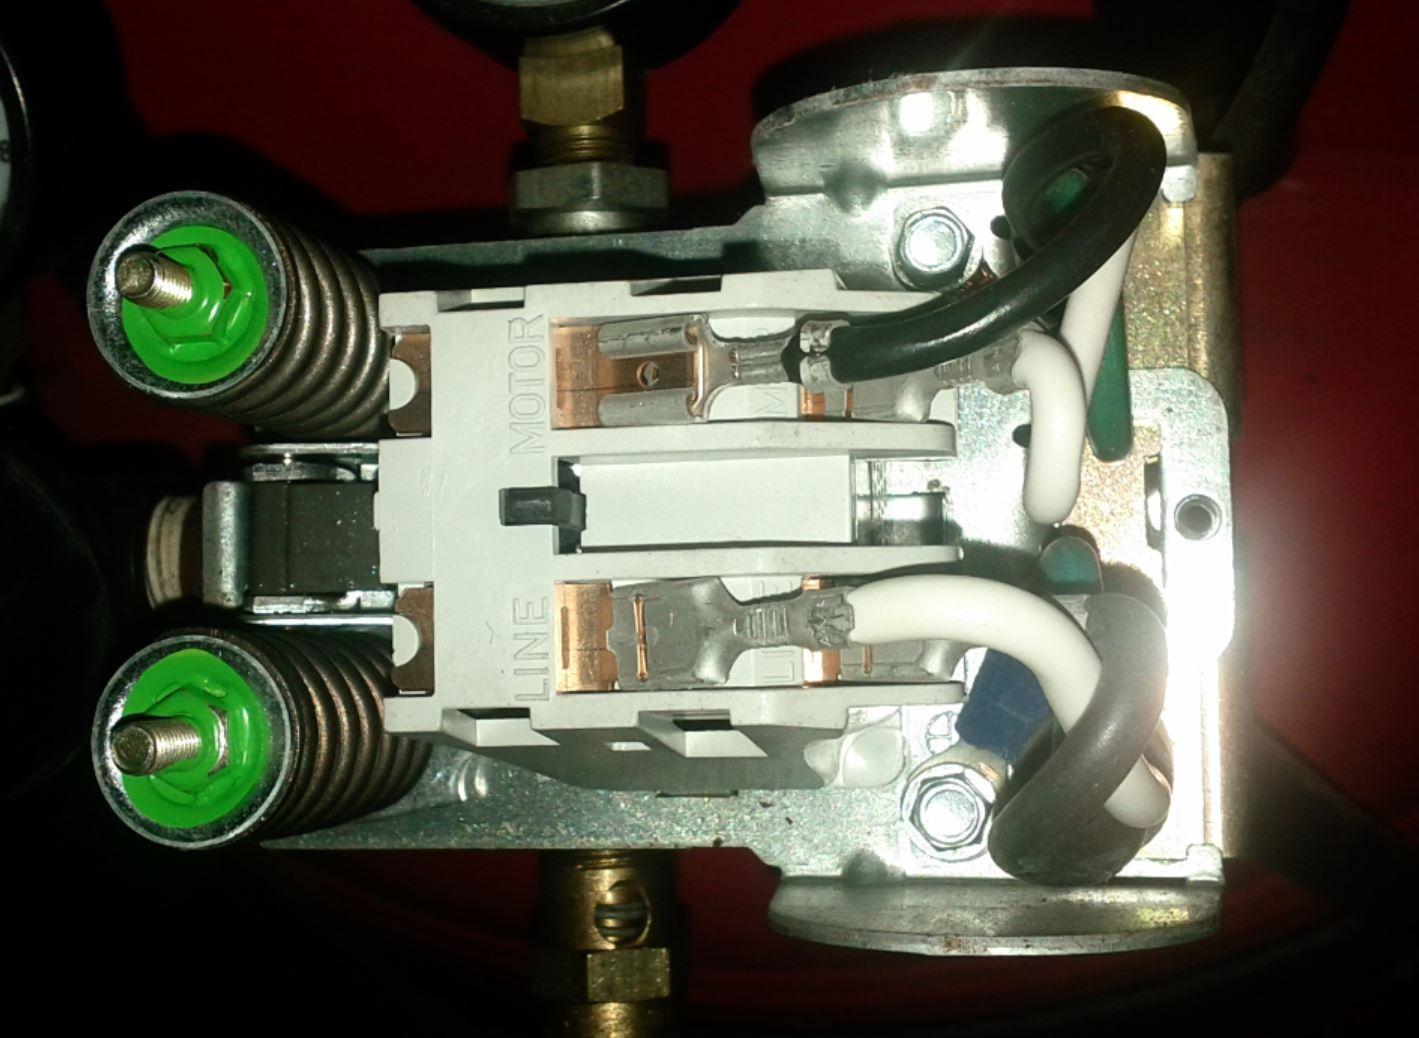 How To Wire A 240v Air Compressor Diagram Simple Air